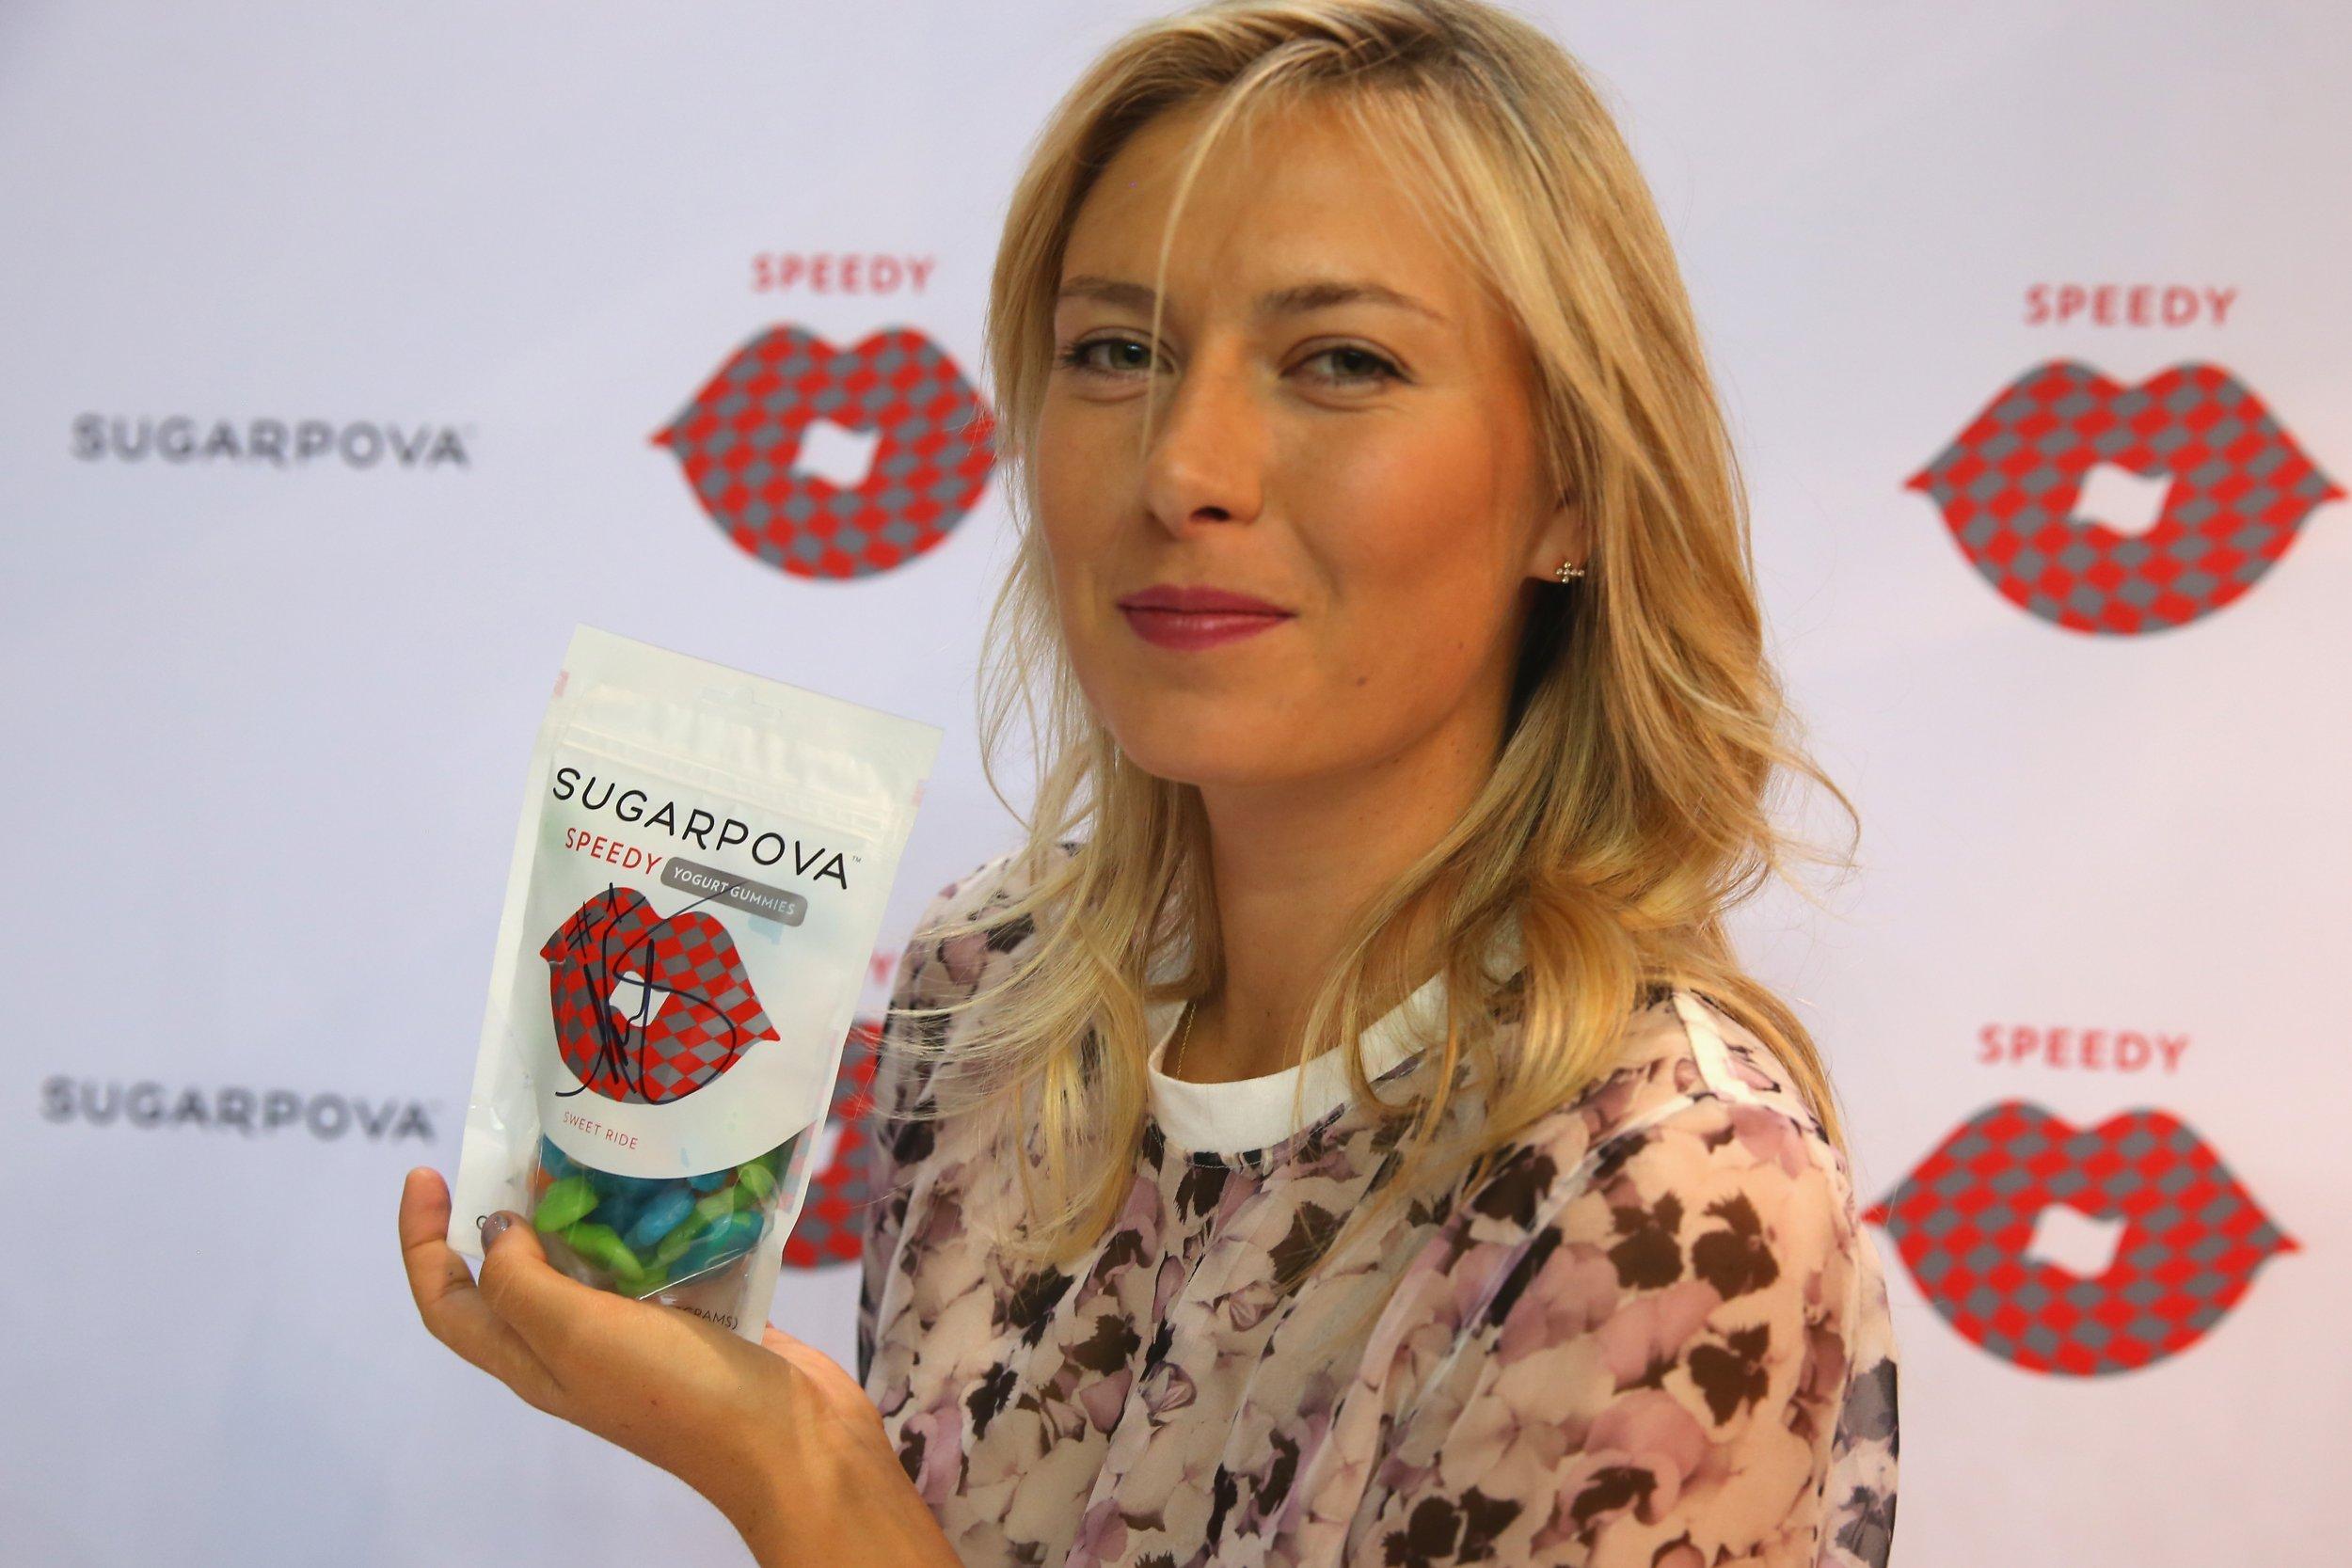 Maria Sharapova : Hot Russian Tennis Star Sexy, Nude And